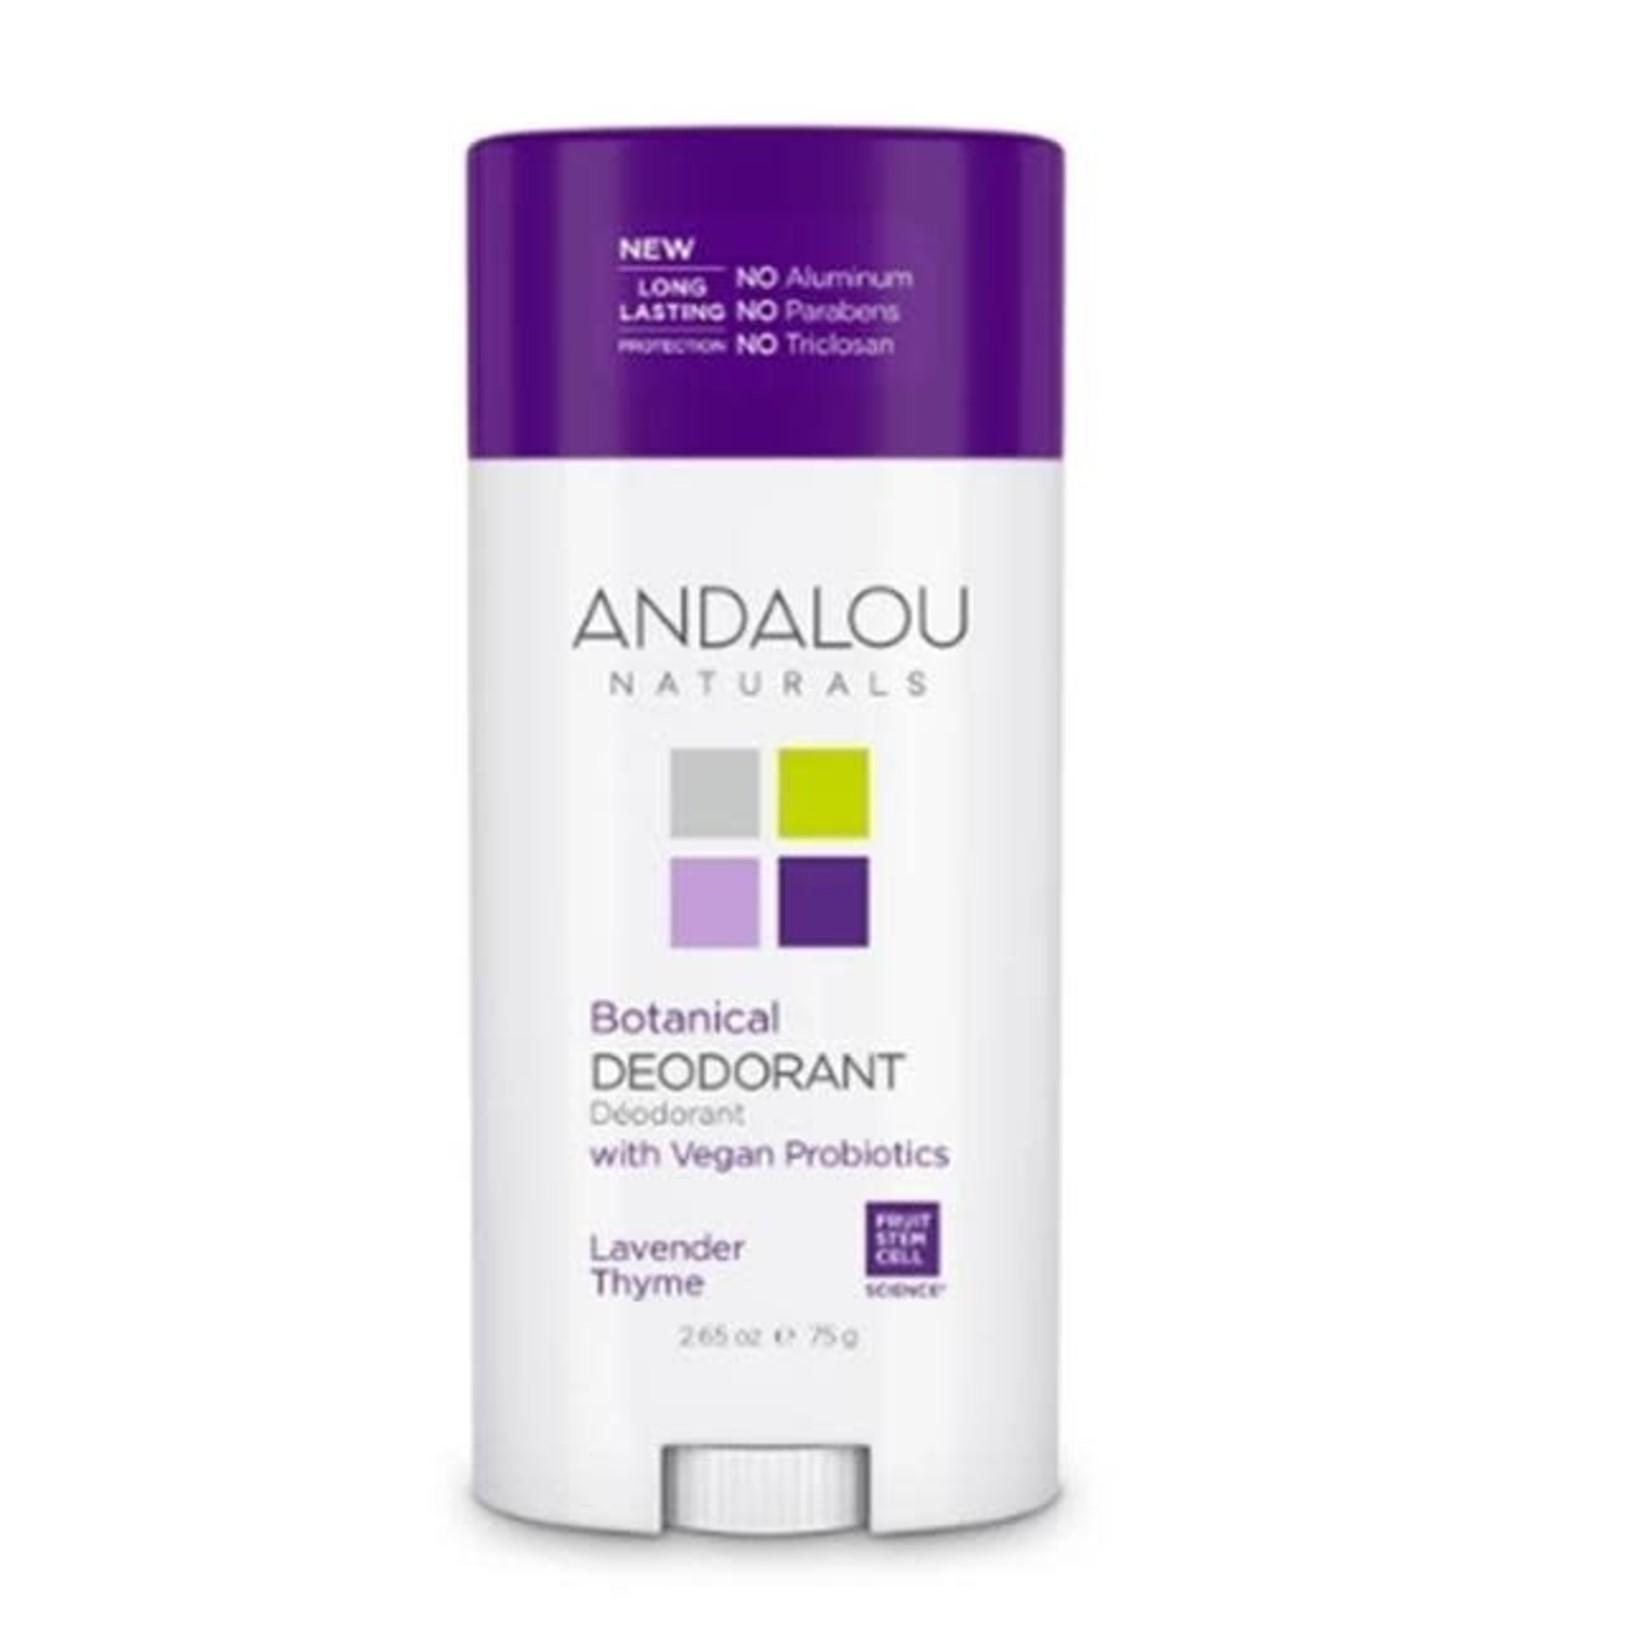 Andalou Andalou Lavender Thyme Botanical Deodorant